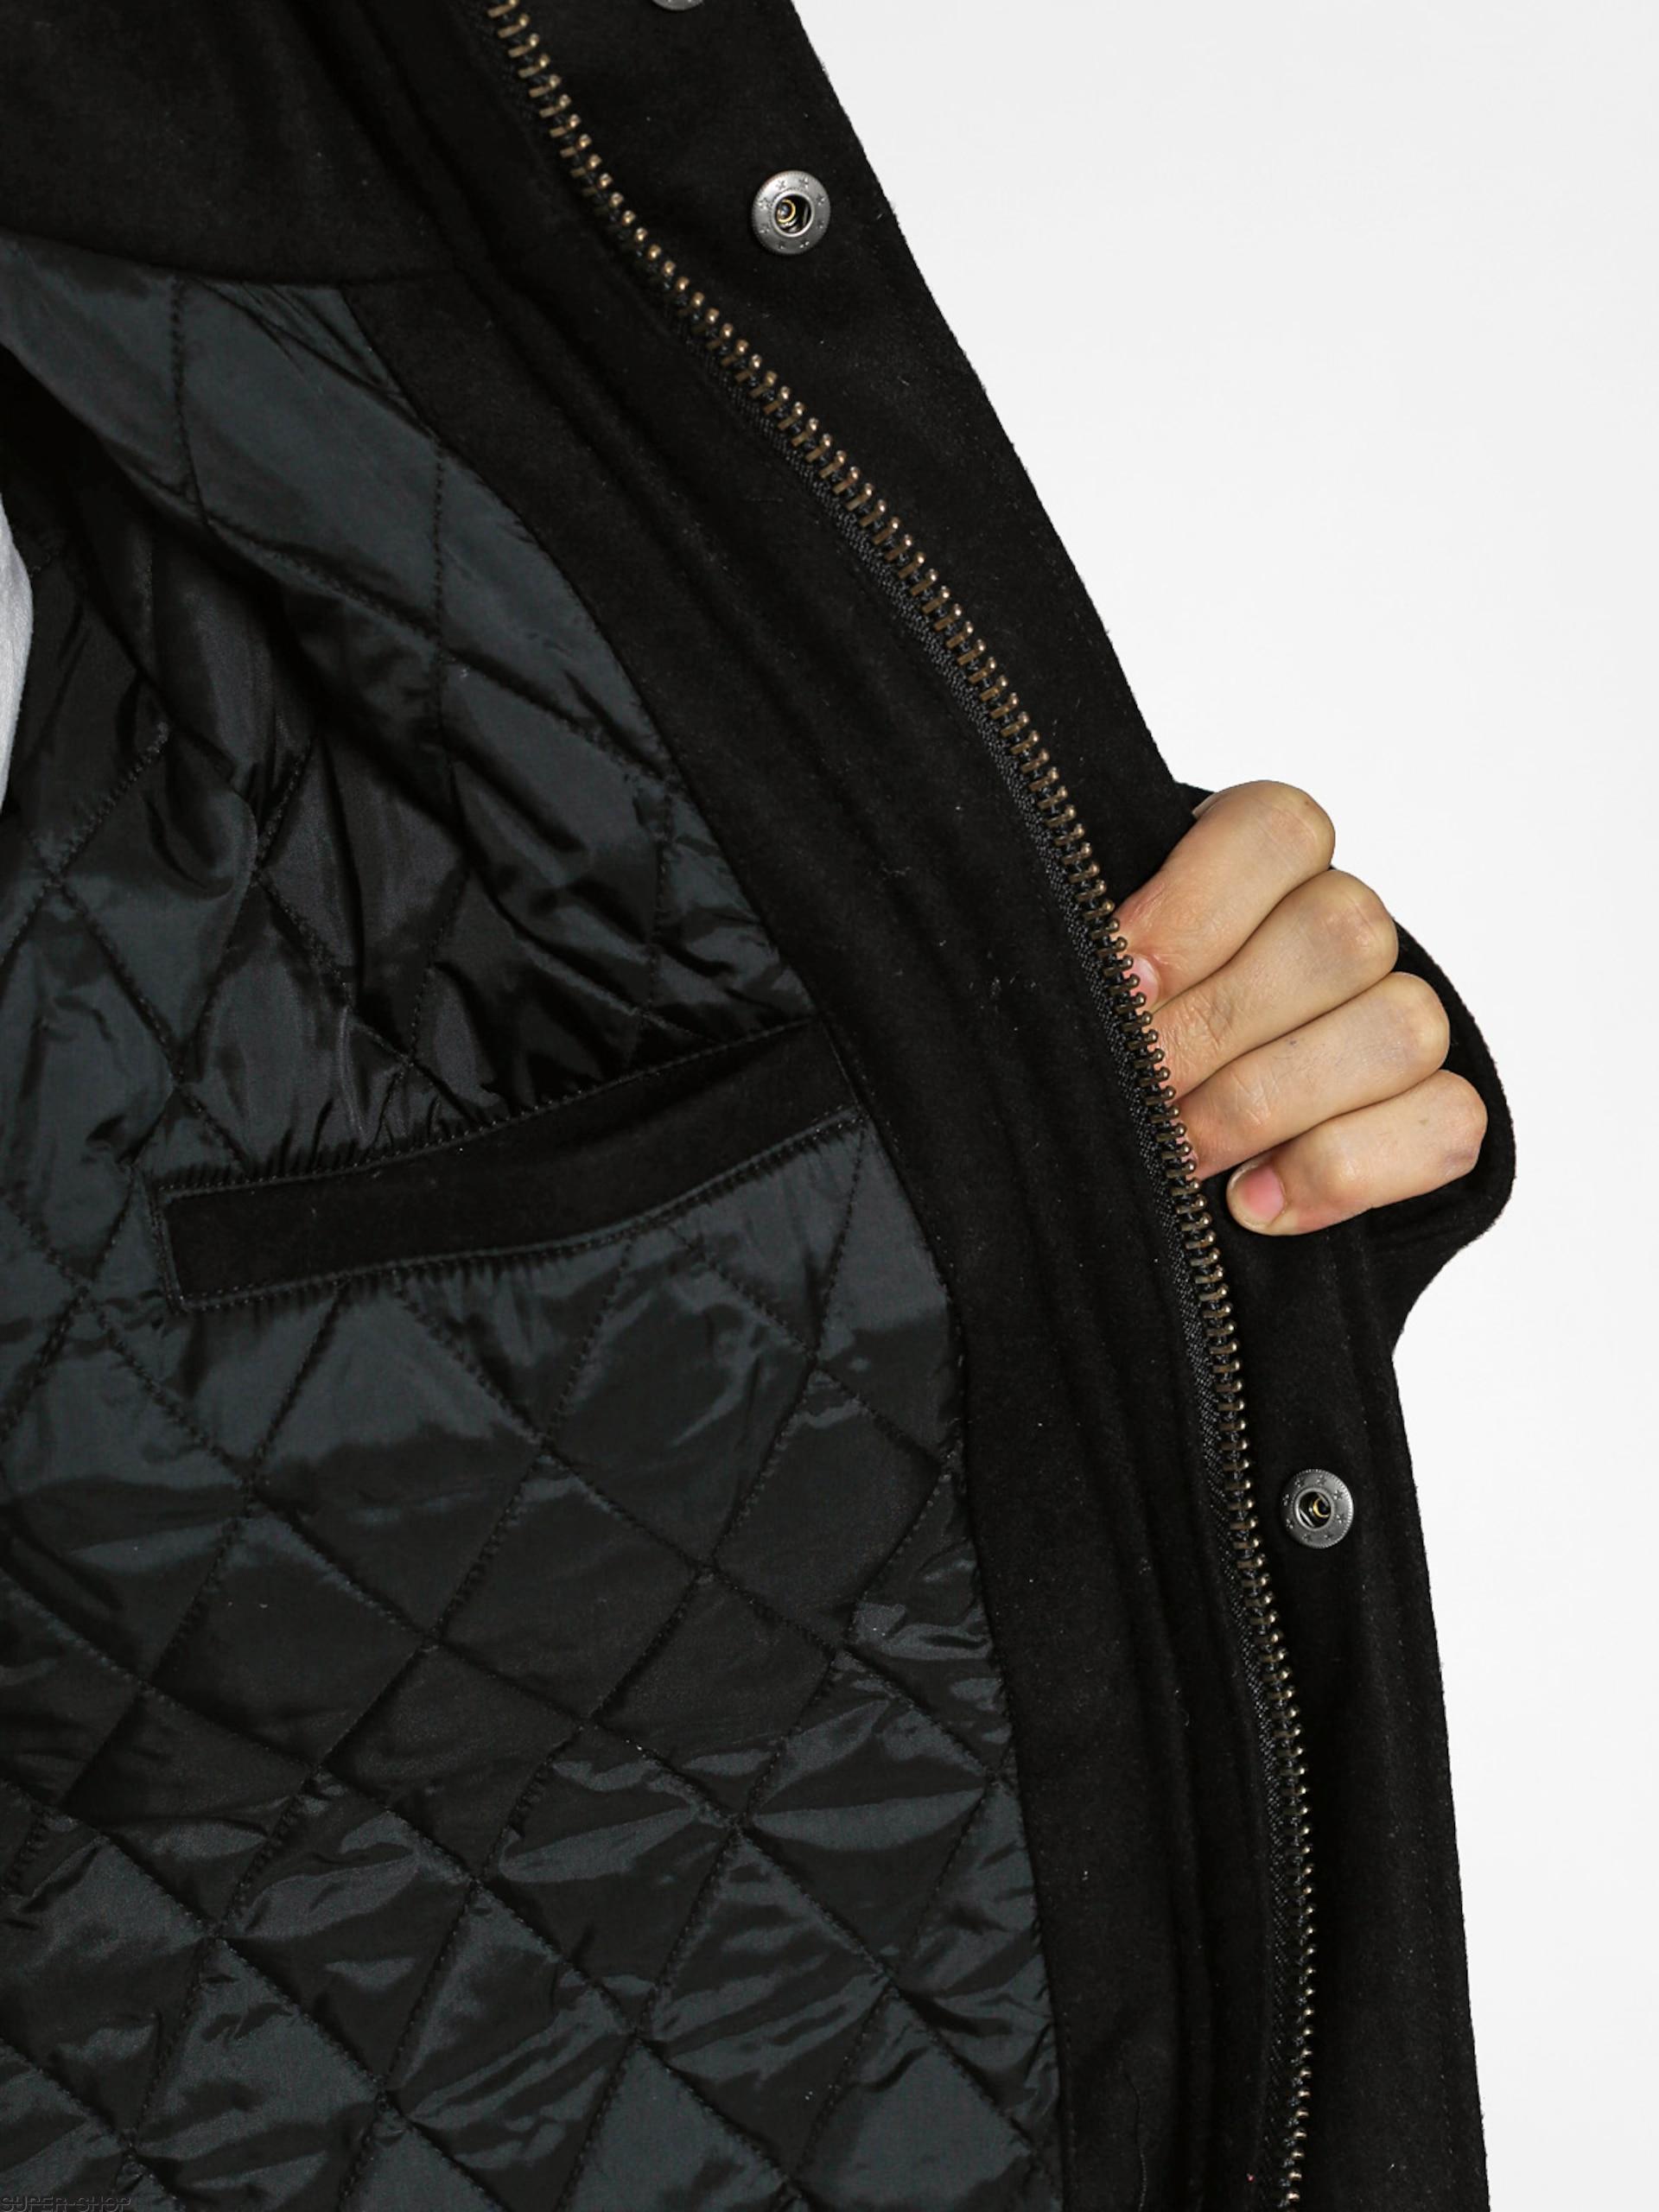 TR7FD15DE Puffin Navy Zipper Canvas Coin Purse Wallet Cellphone Bag With Handle Make Up Bag